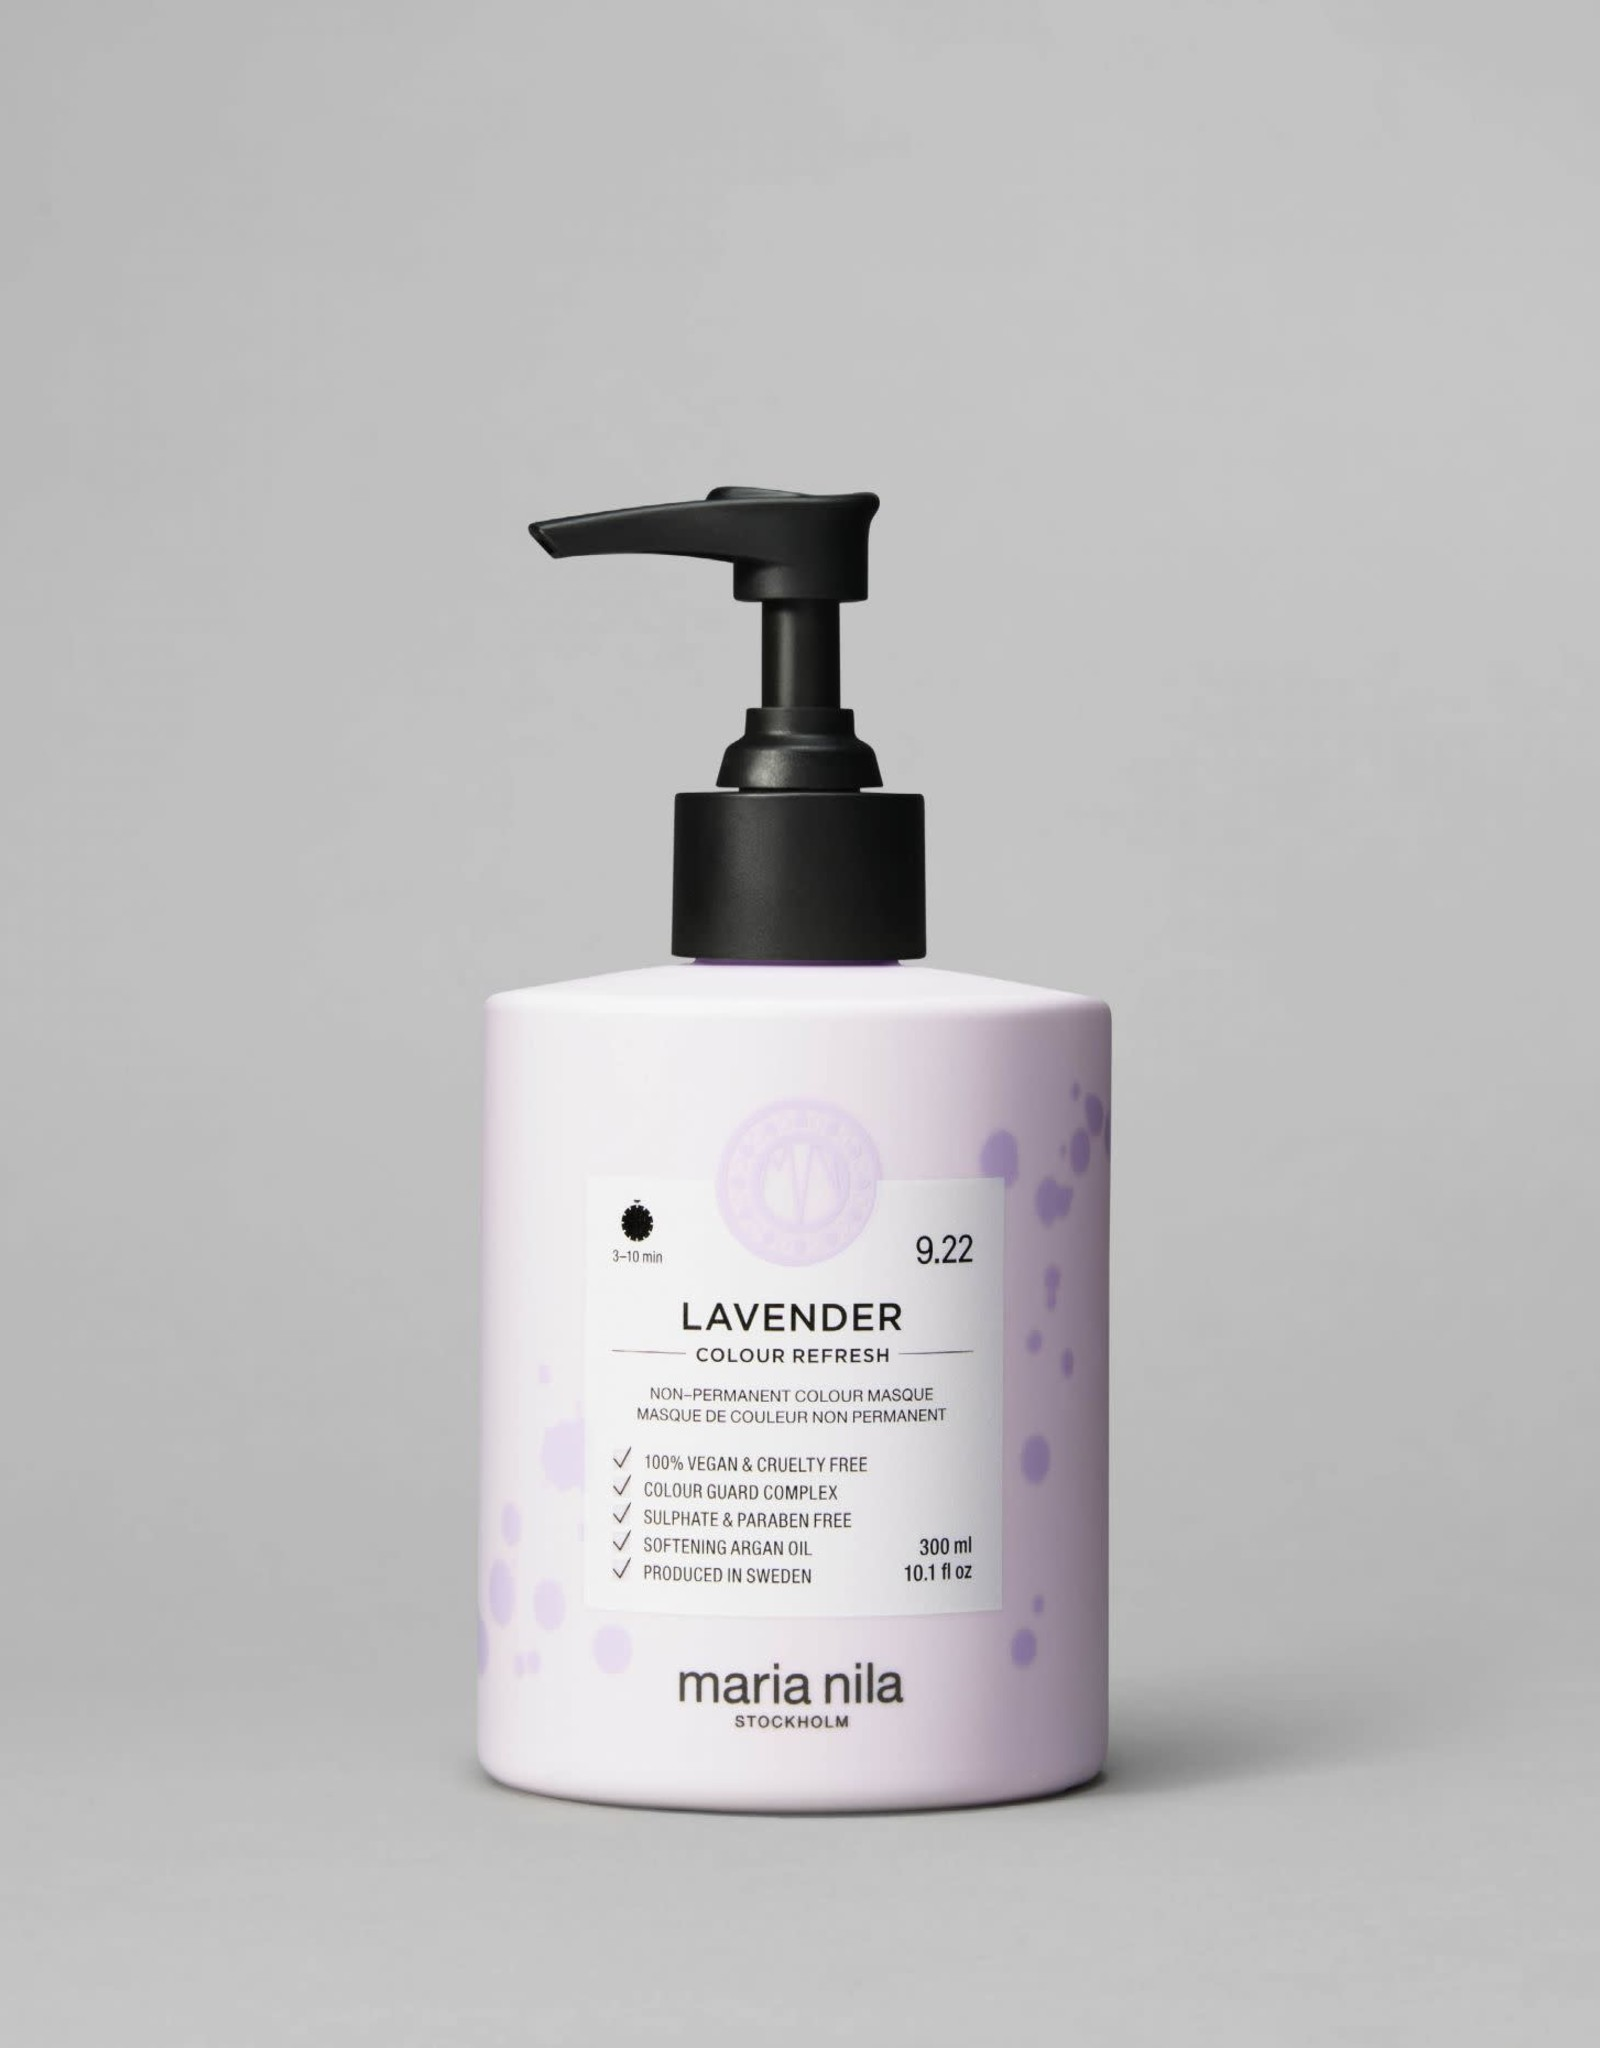 Maria Nila Colour Refresh Lavender 300ml